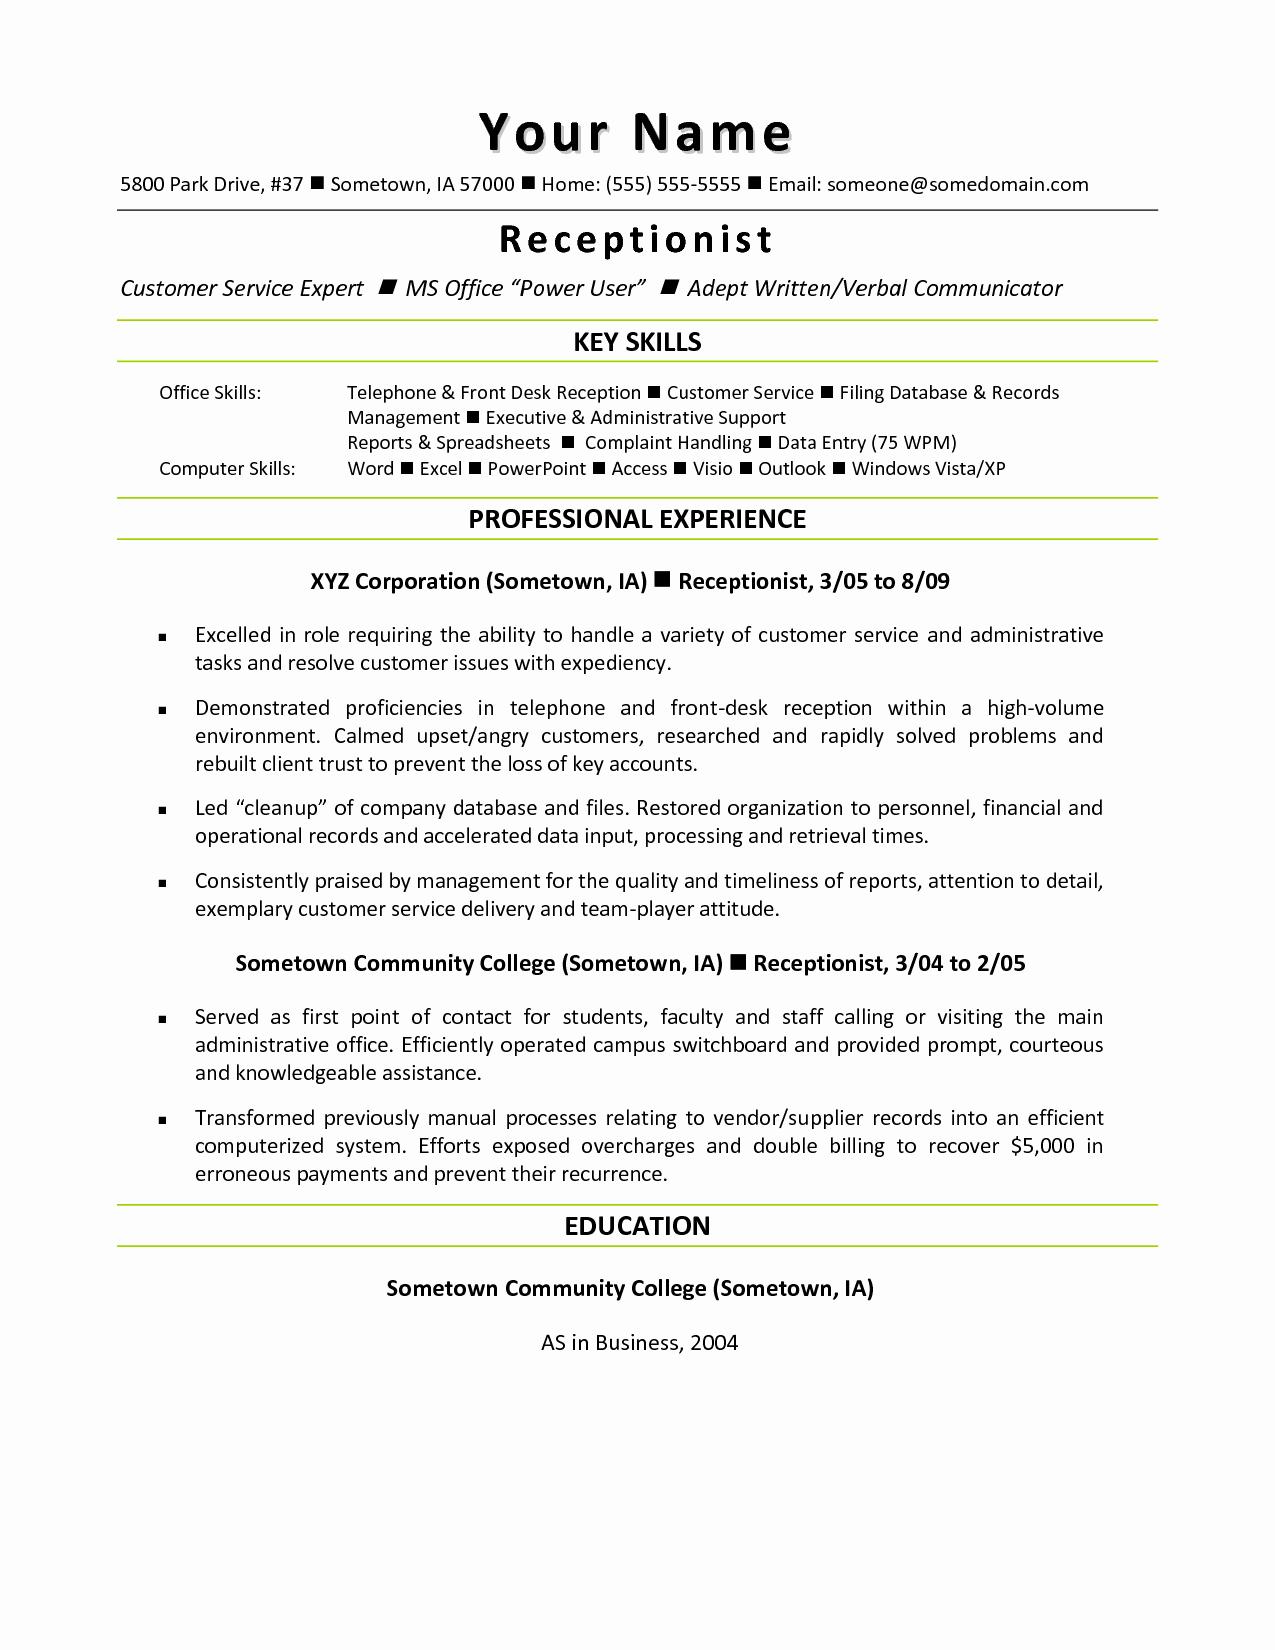 Medical Cover Letter Template - Medical assistant Sample Resume Fresh Sample Cover Letter for